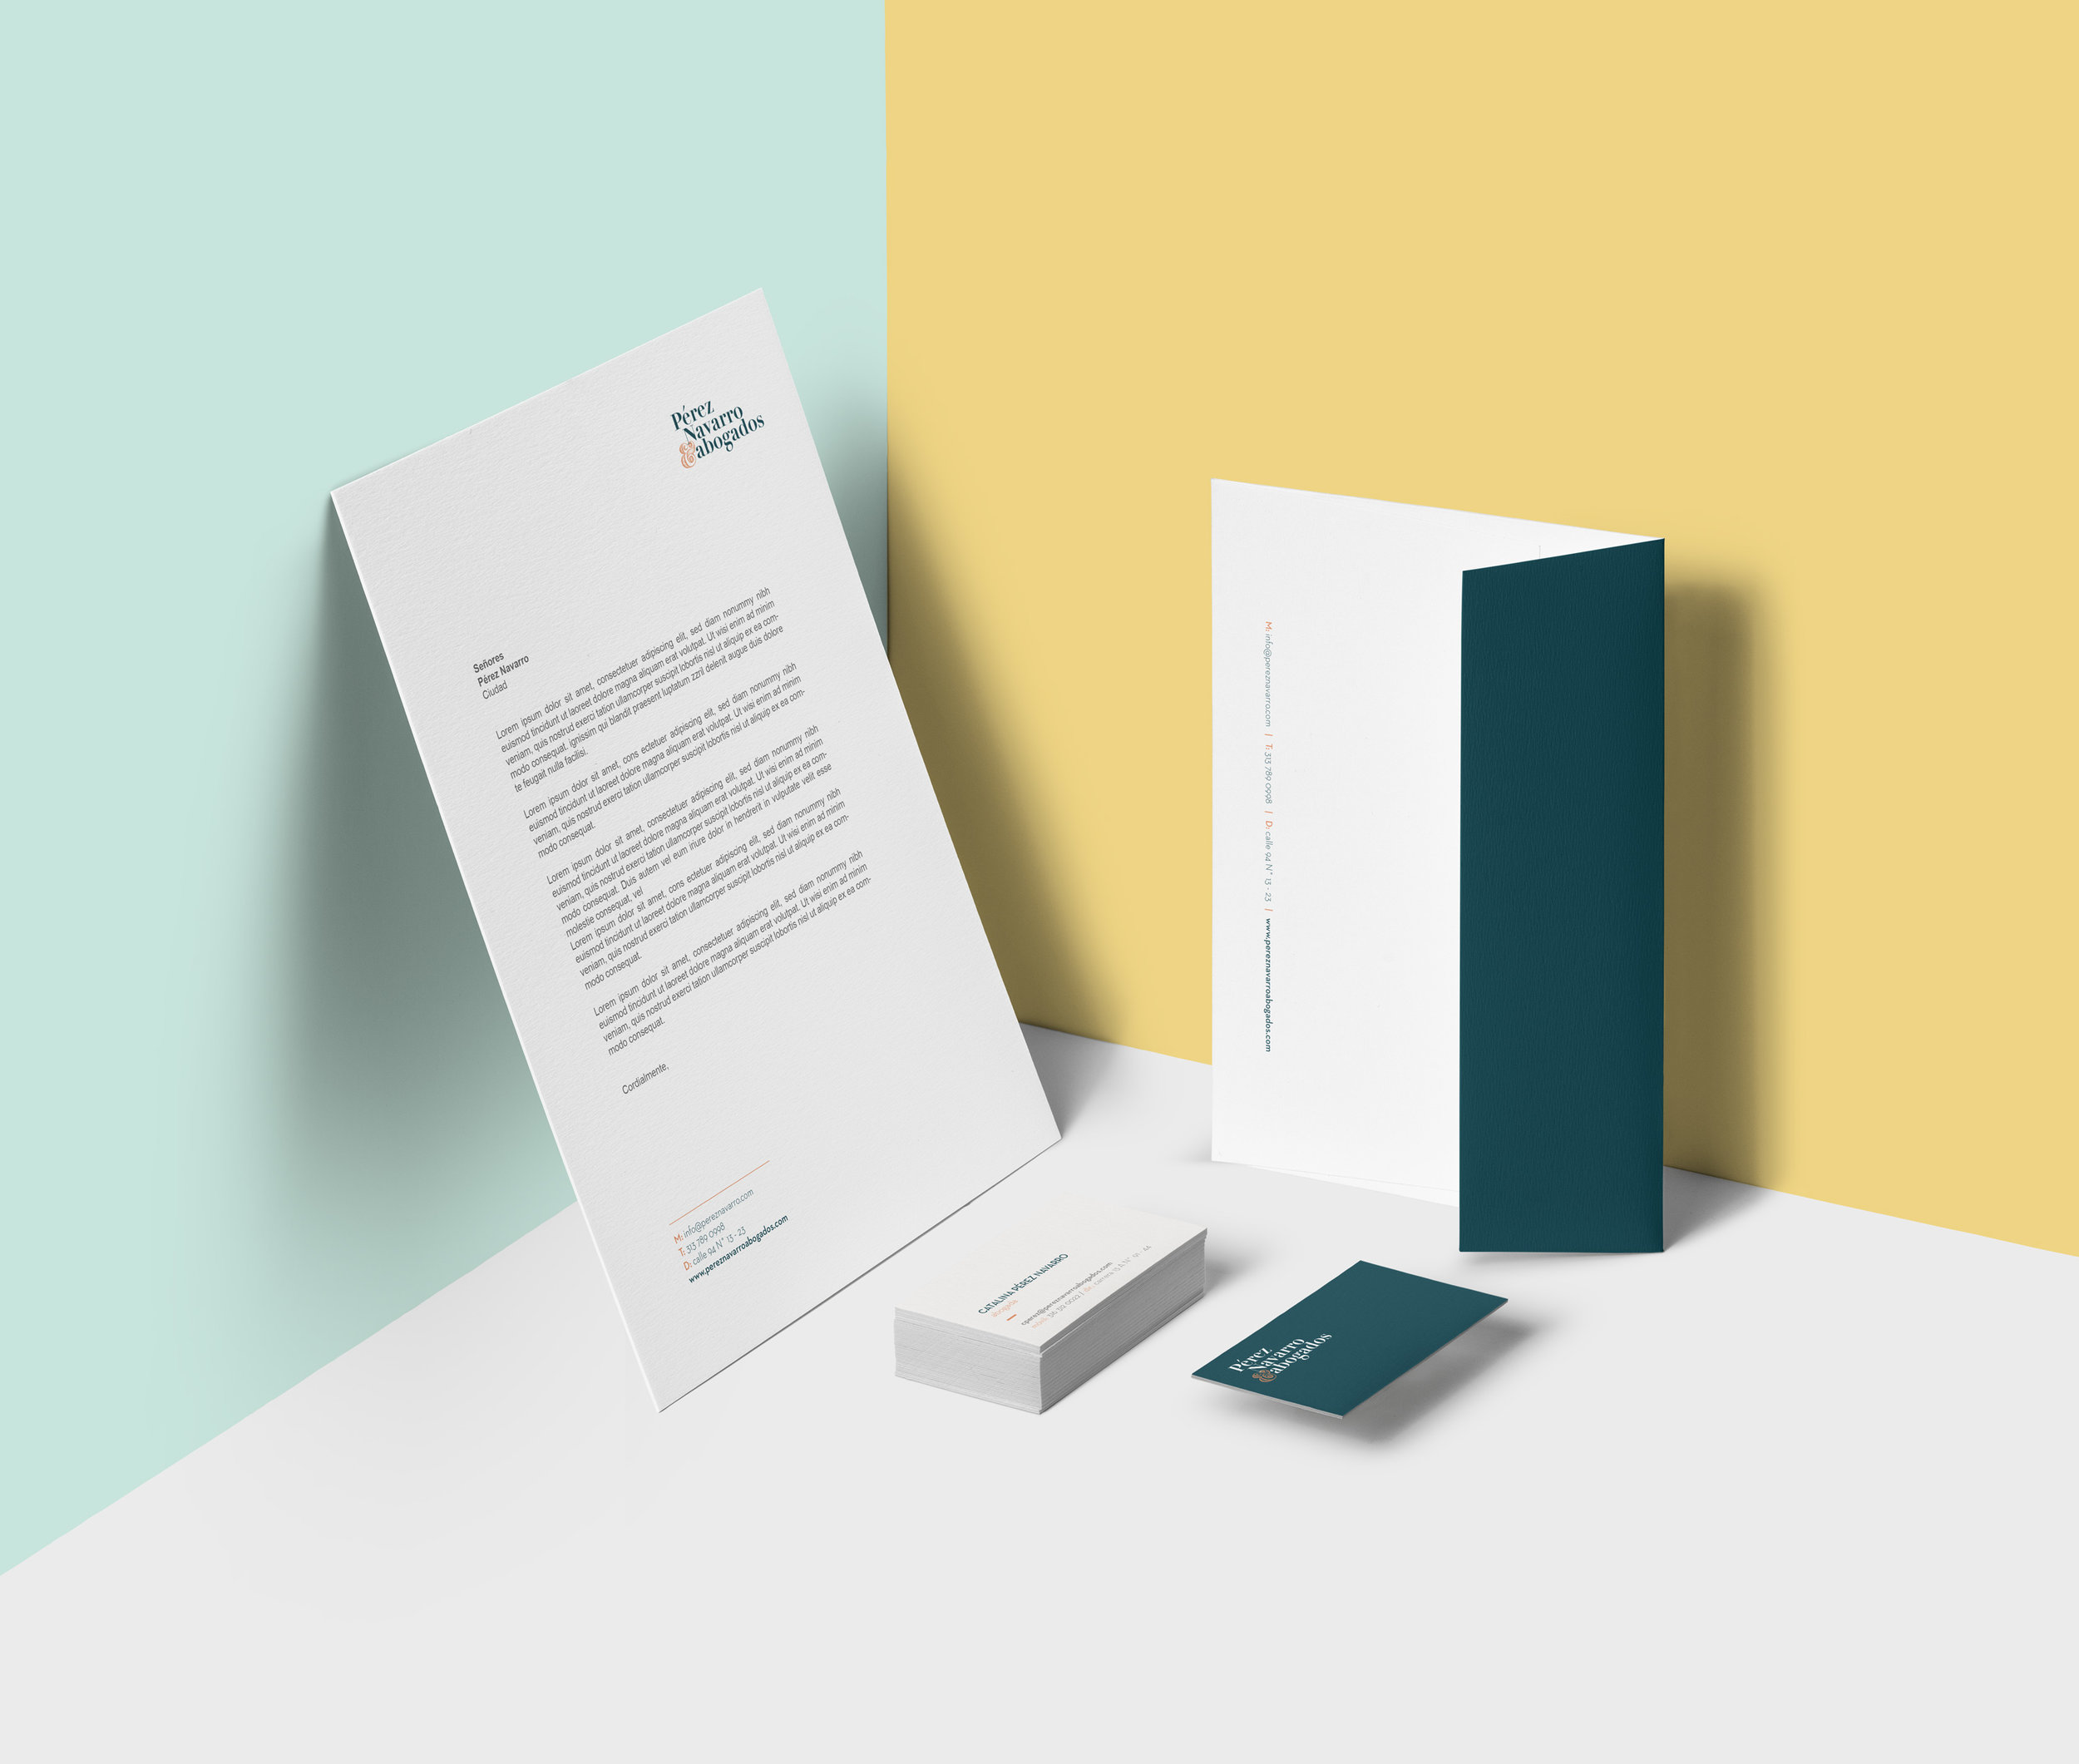 Basic-Stationery-Branding-Vol19.jpg